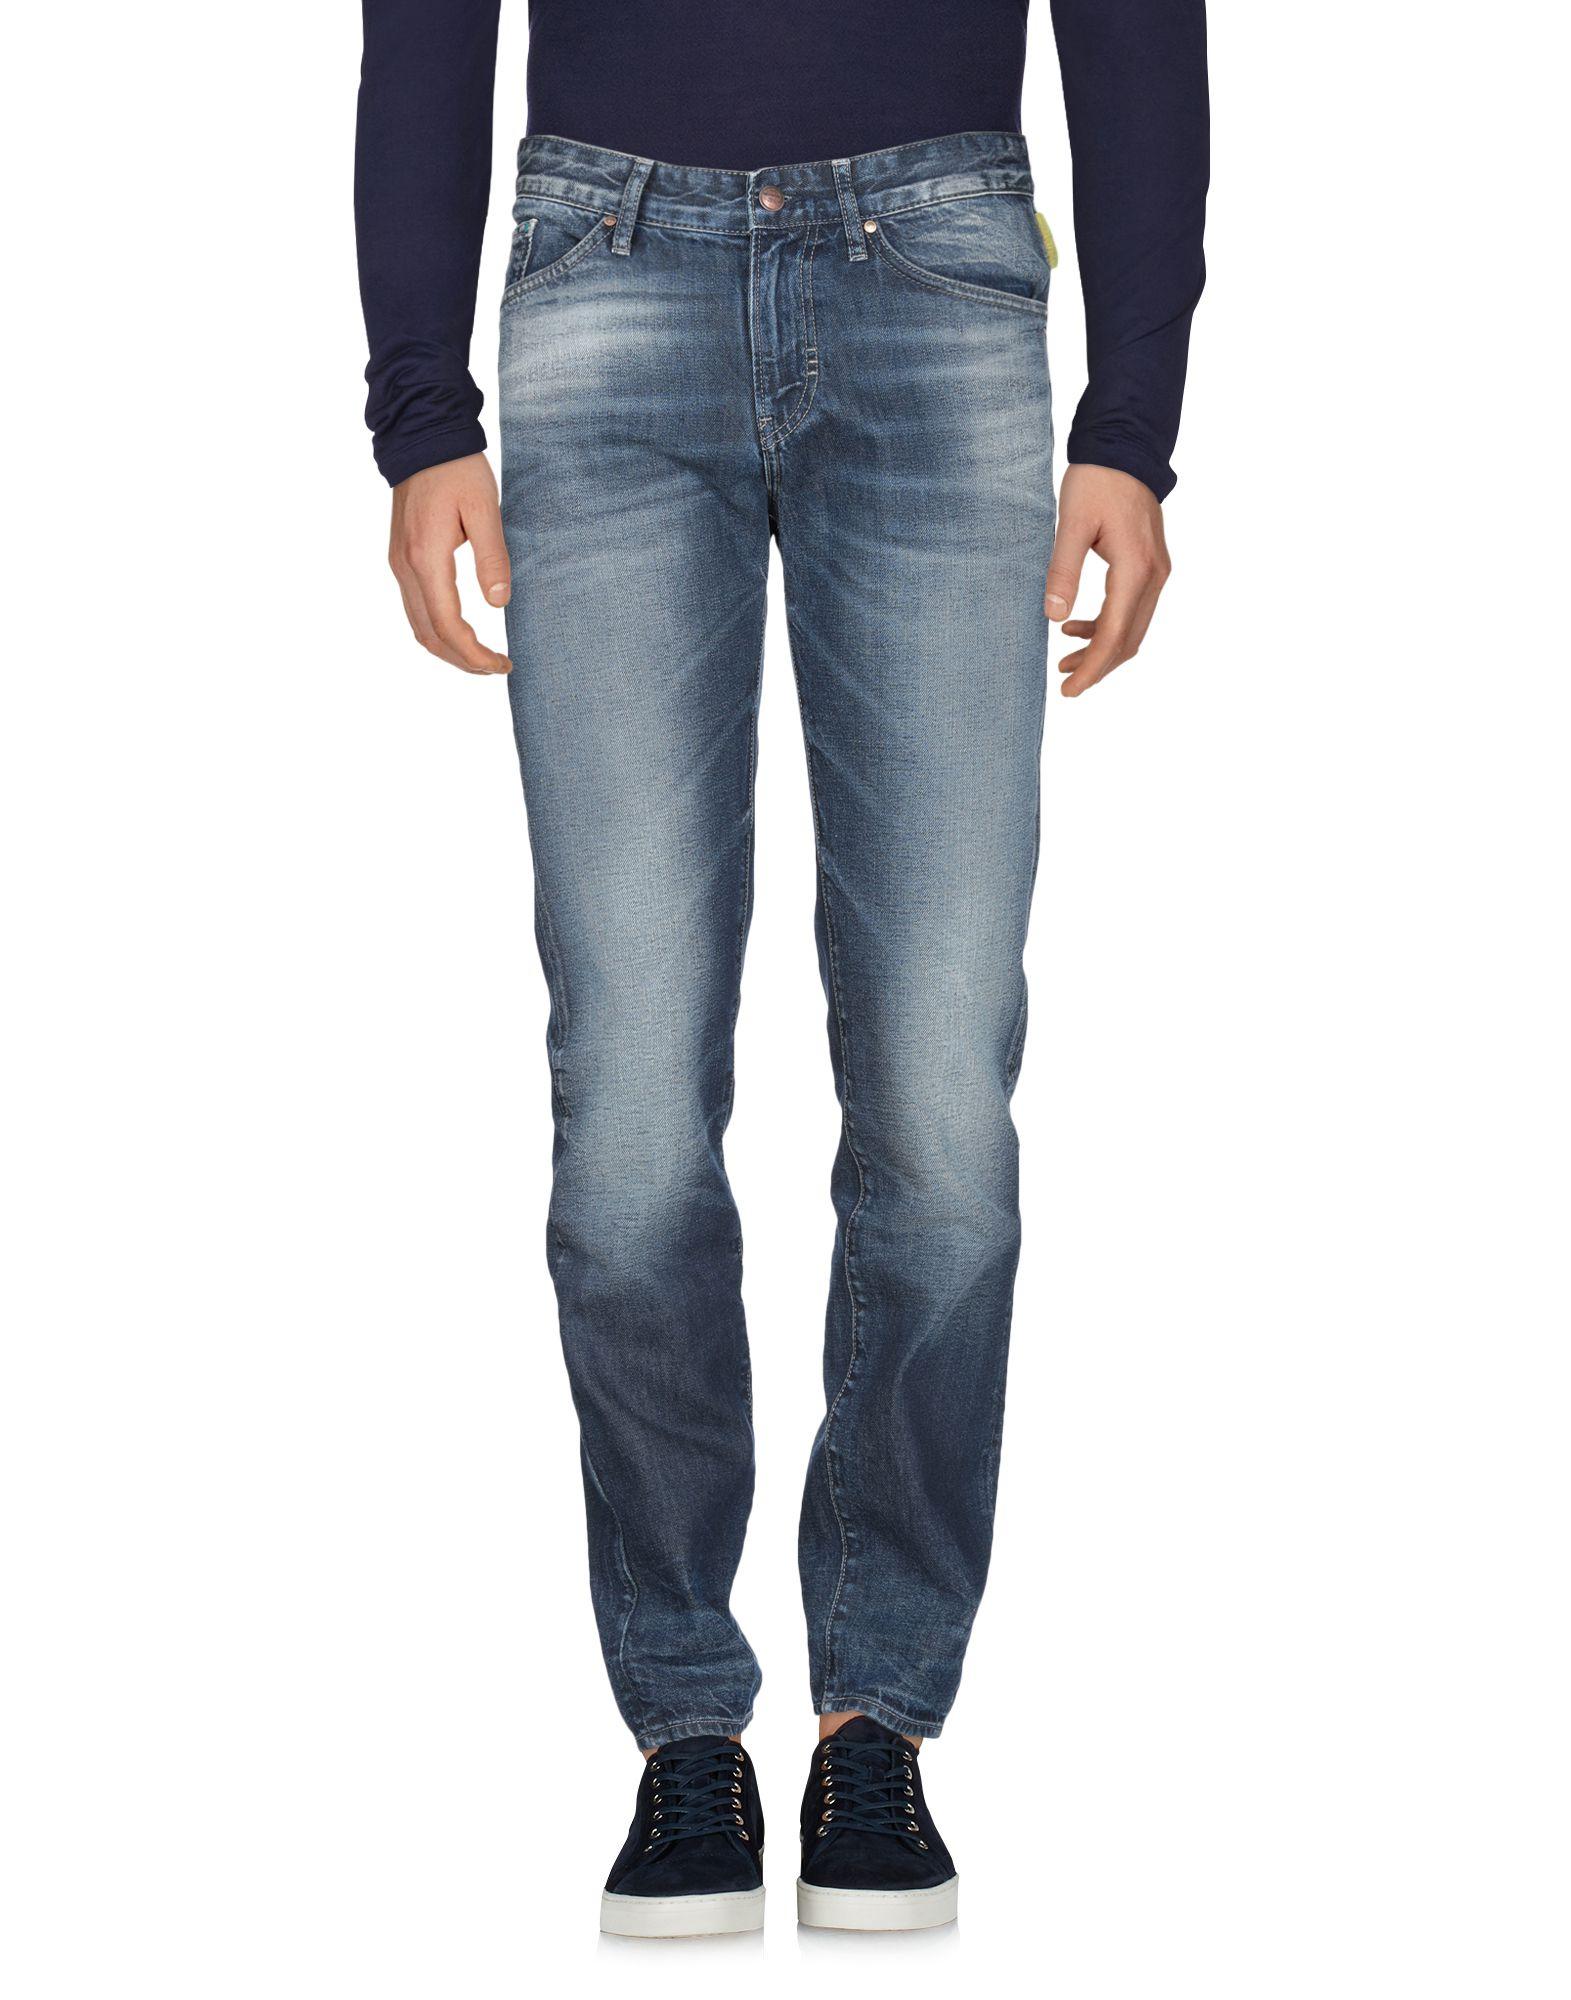 Pantaloni Uomo Jeans Meltin Pot Uomo Pantaloni - 42687381ND eb560a